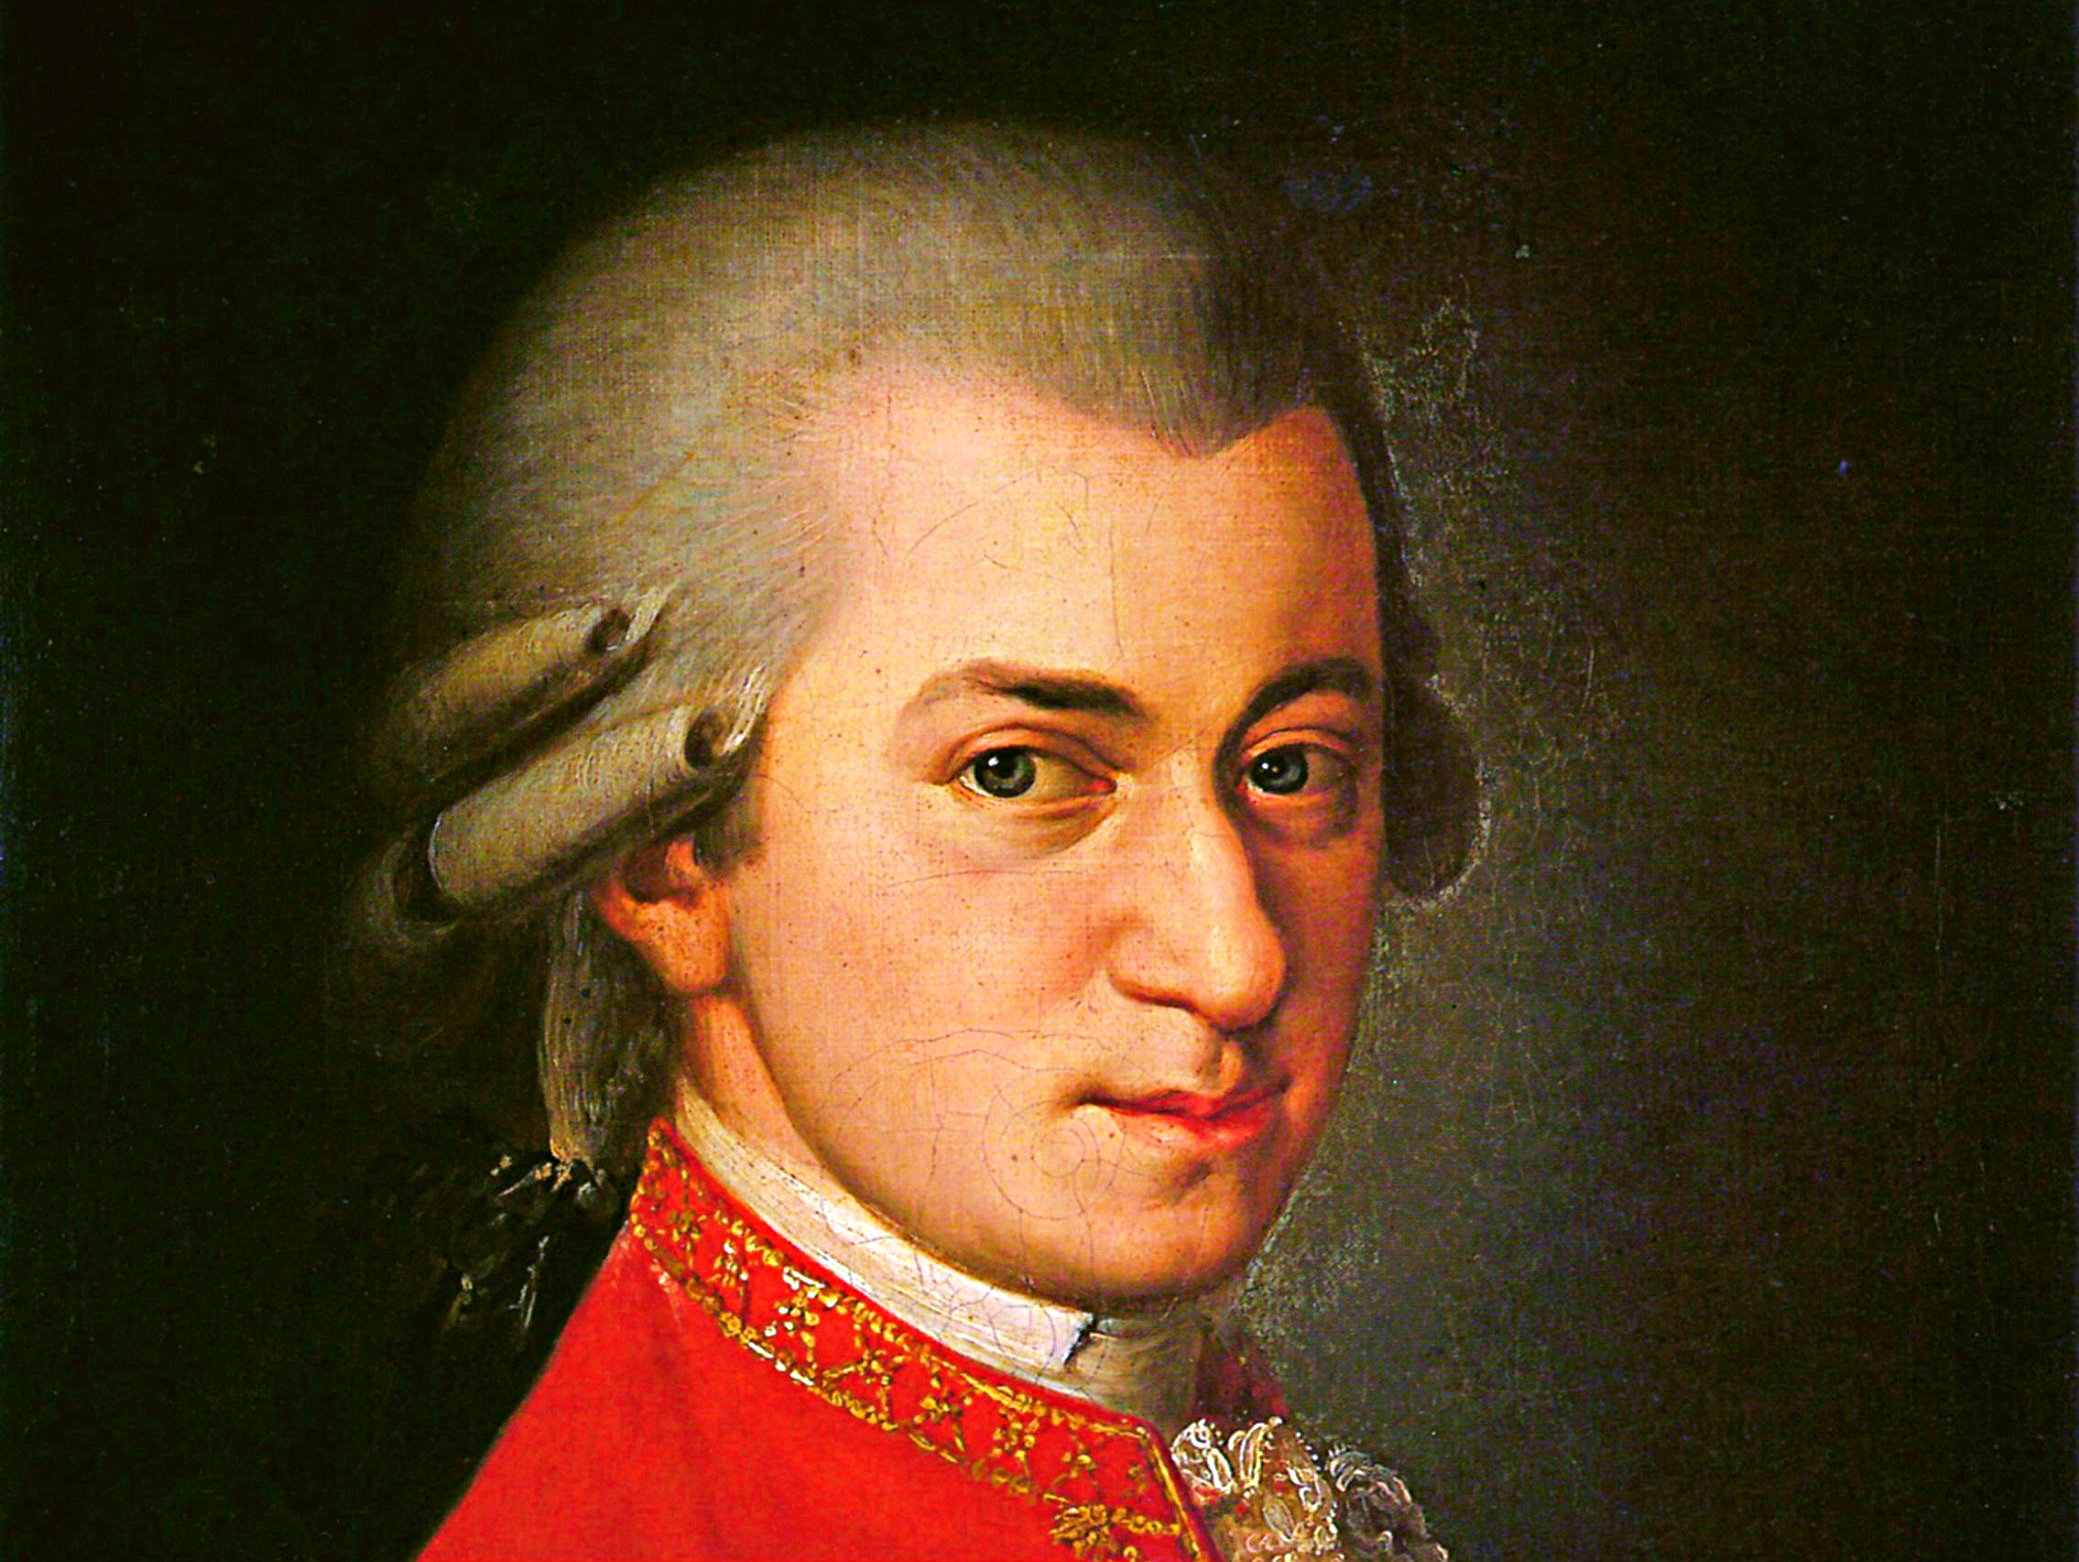 <p>Wolfgang Amadeus Mozart</p>